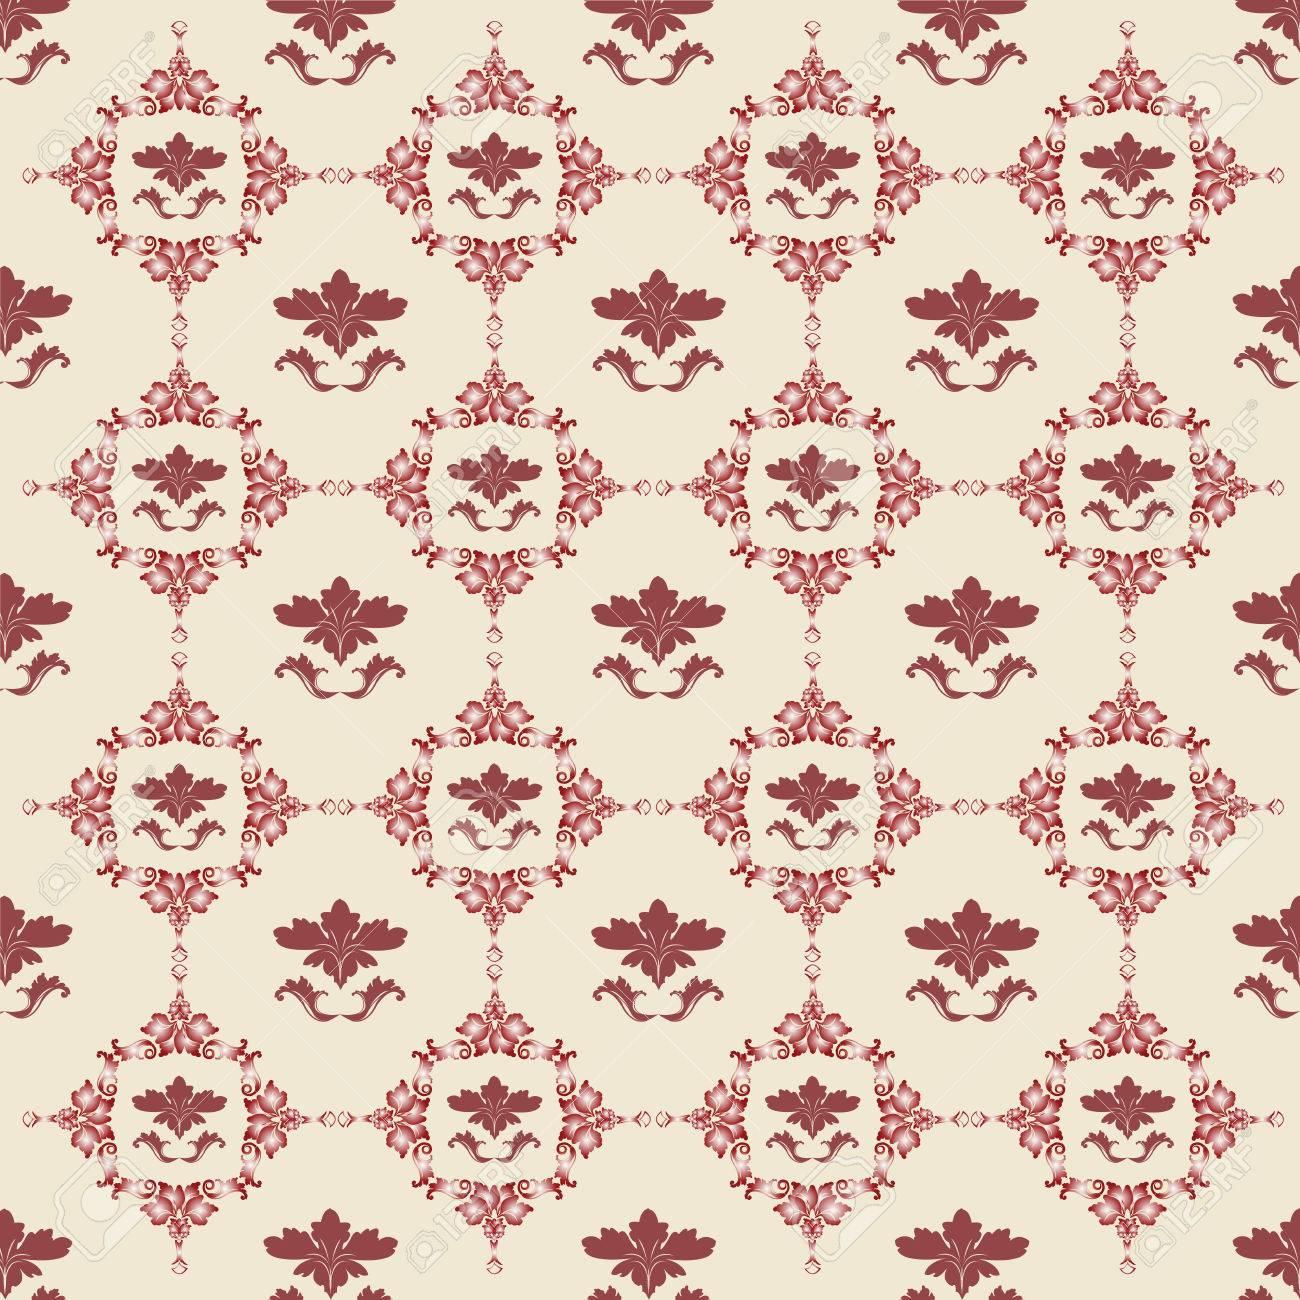 Vector floral background in red, Damask design Stock Vector - 5540152